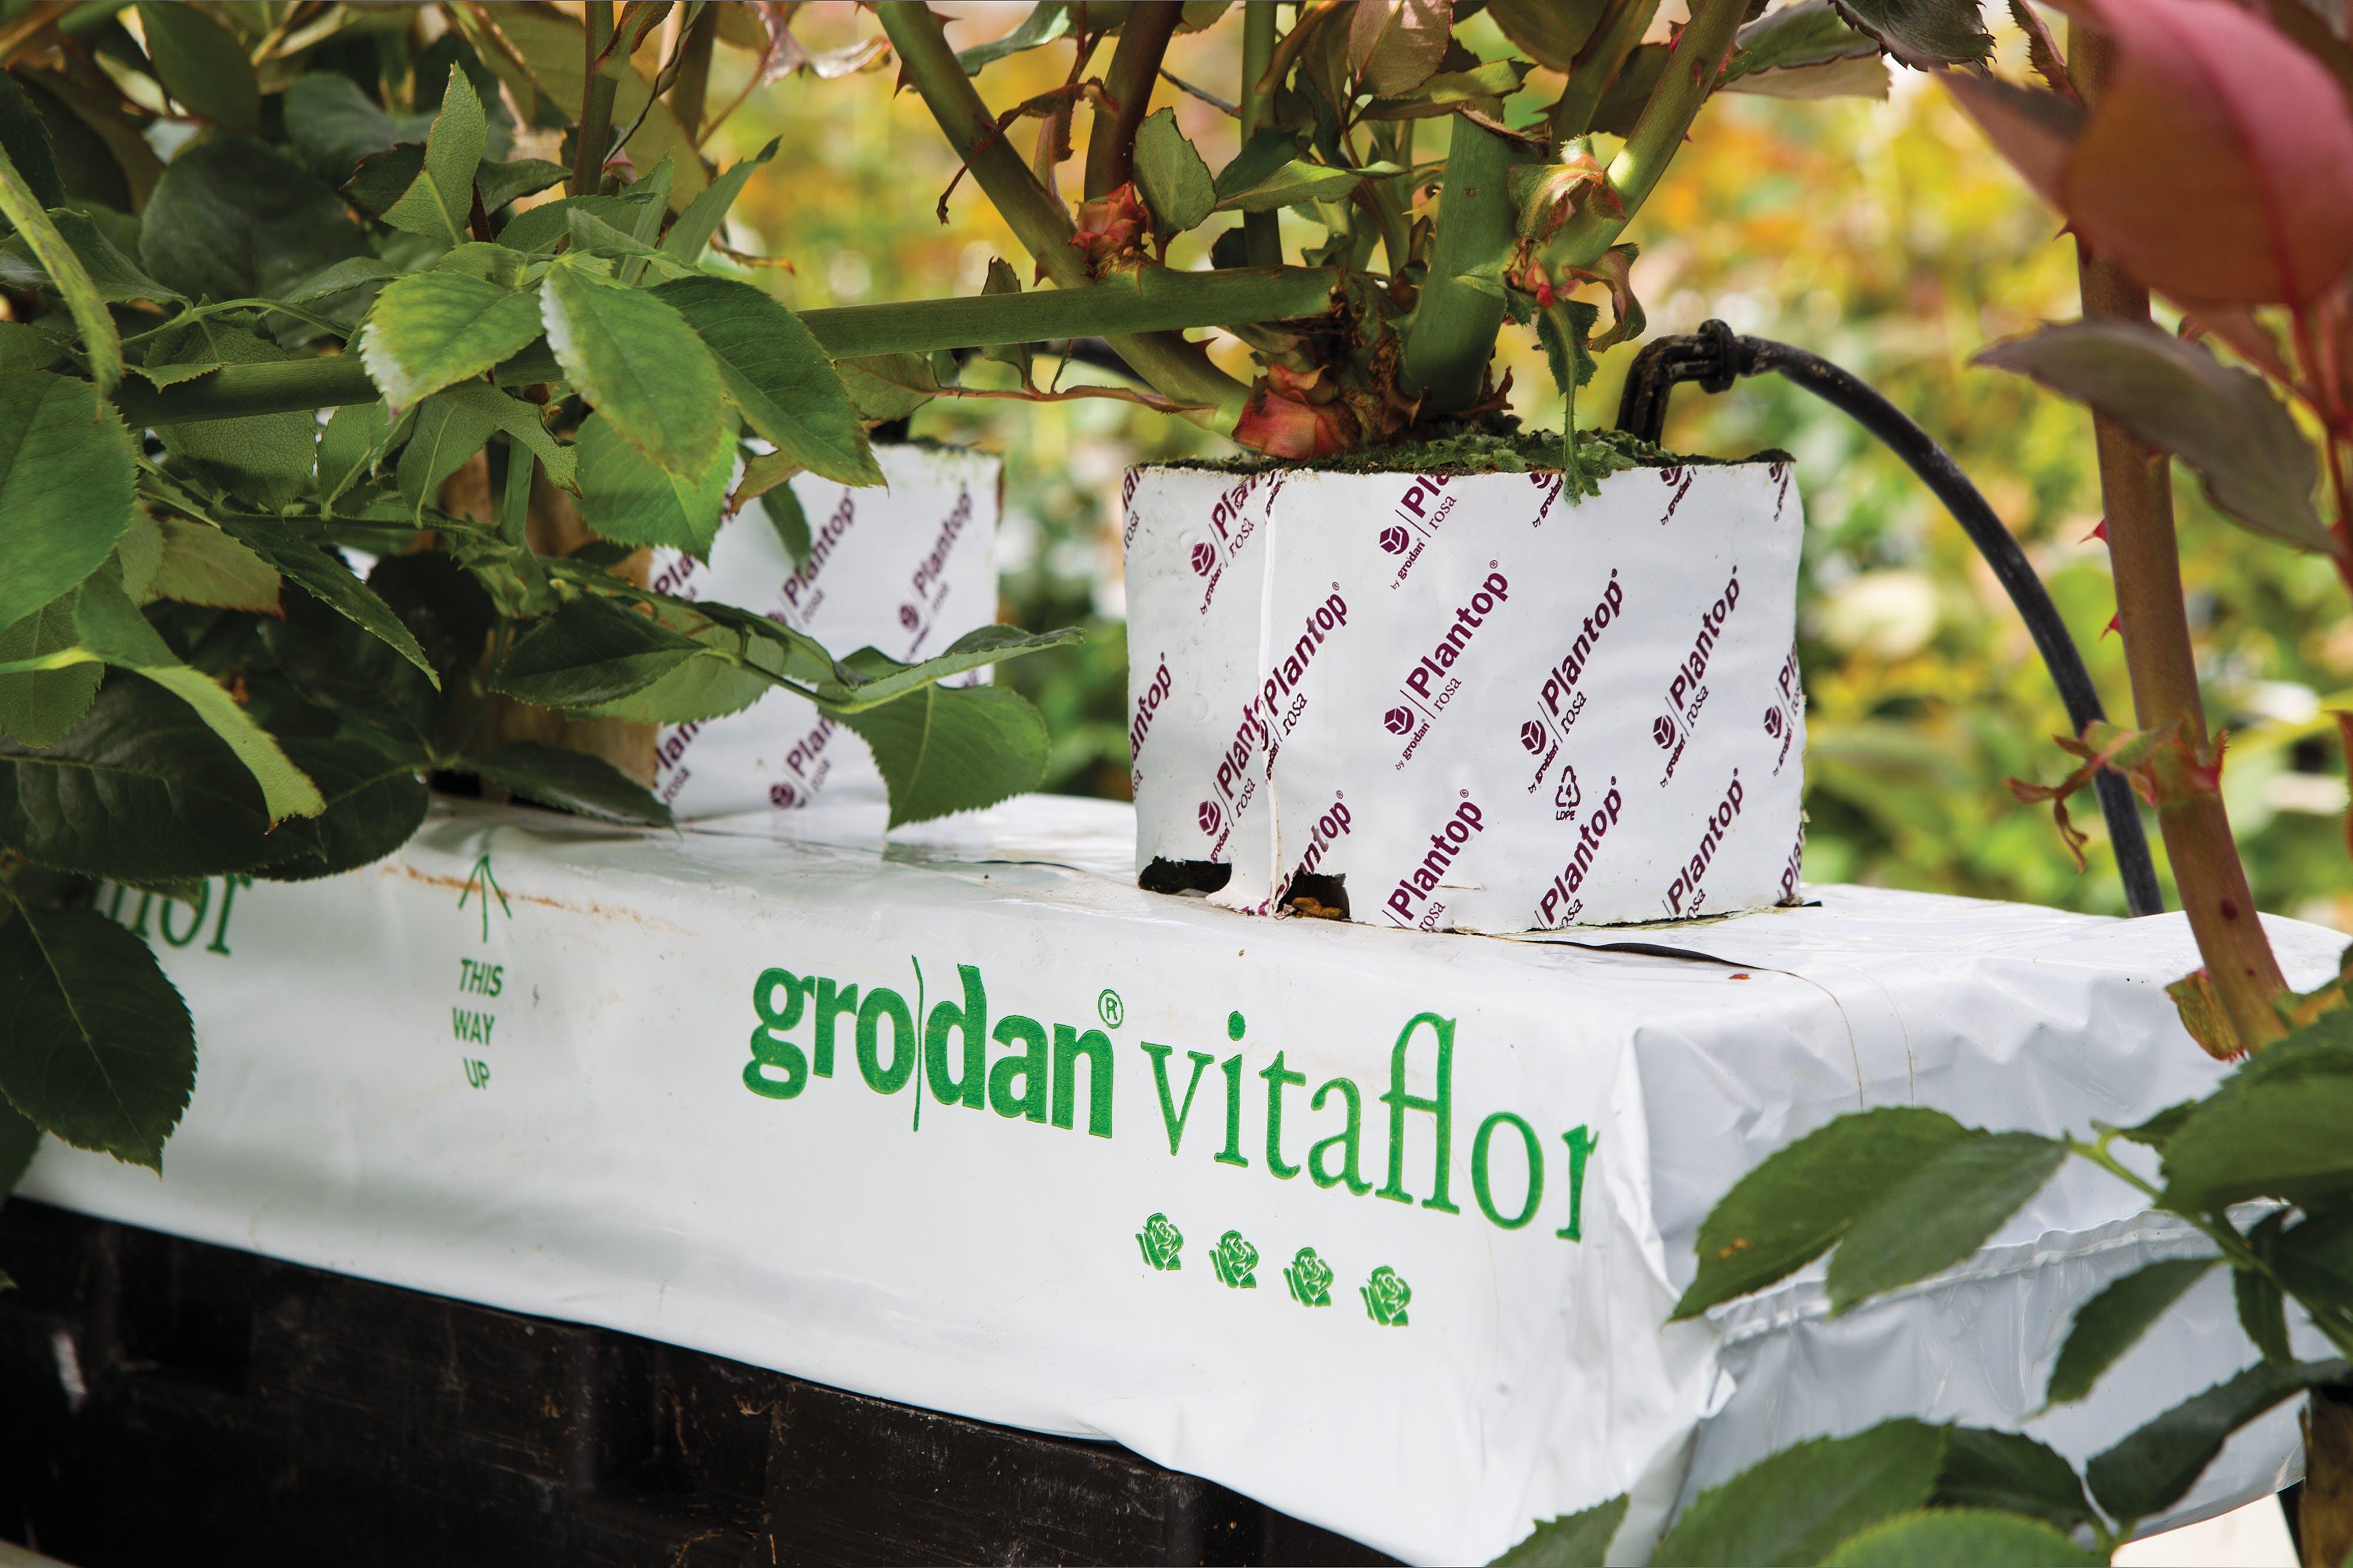 Floriculture Solutions, growth, quality, innovative, development,Grodan Vitaflor slab, rose greenhouse, grodan